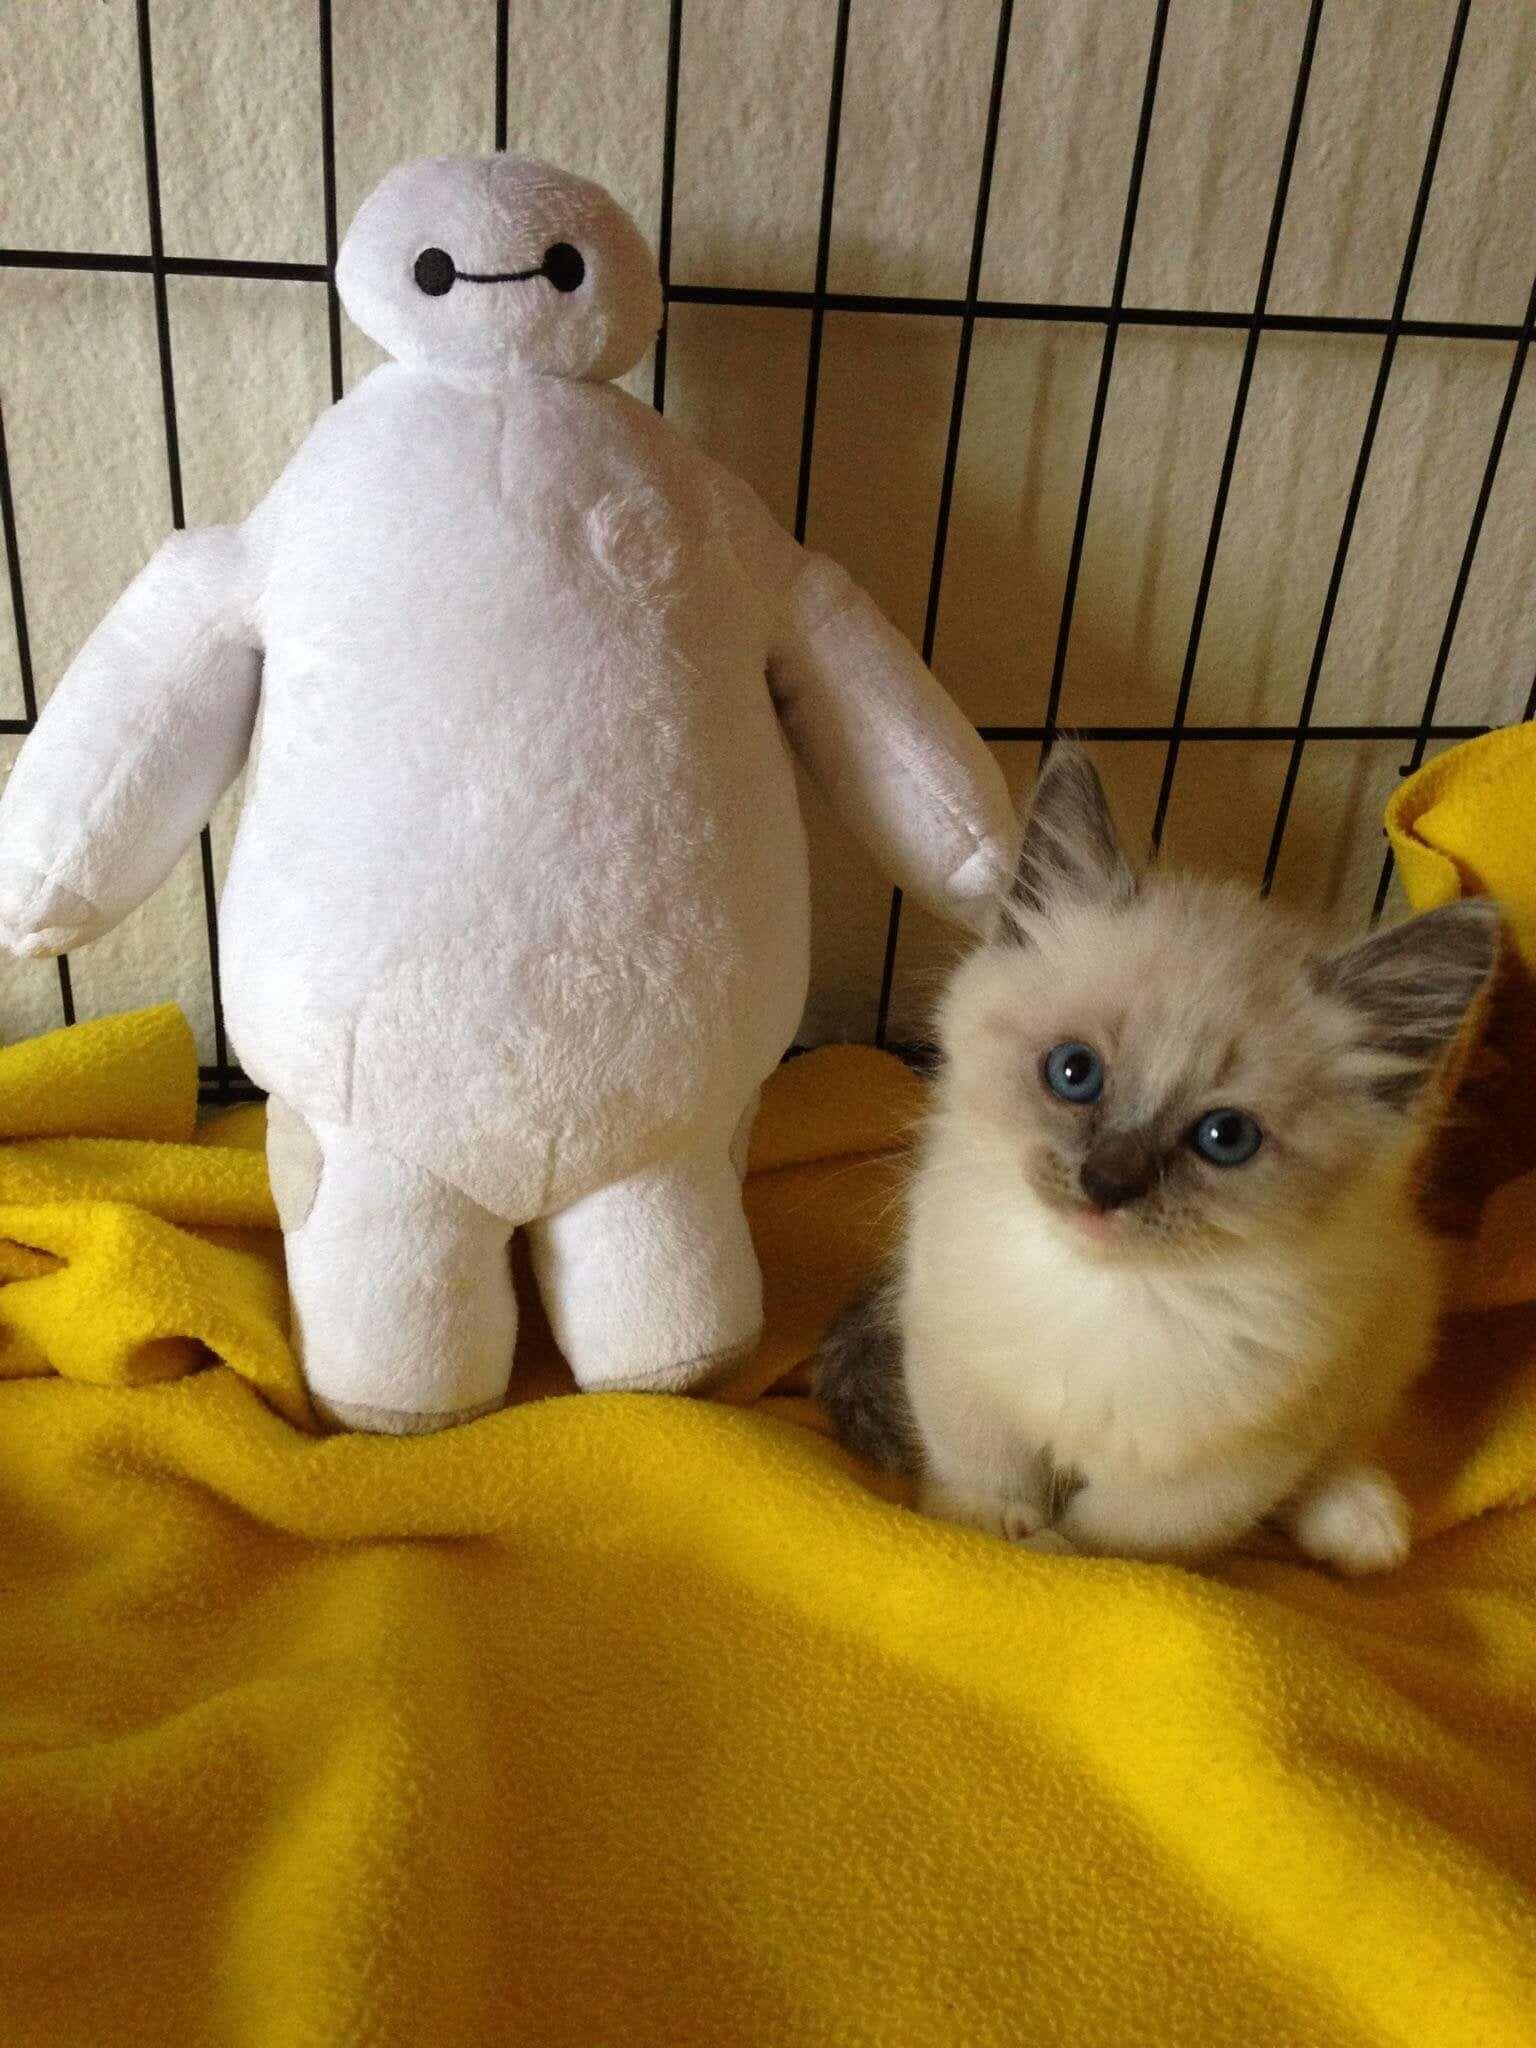 Cara Merawat Bayi Kucing Prematur: Pastikan Kandang Tetap Dalam Suhu Yang Hangat